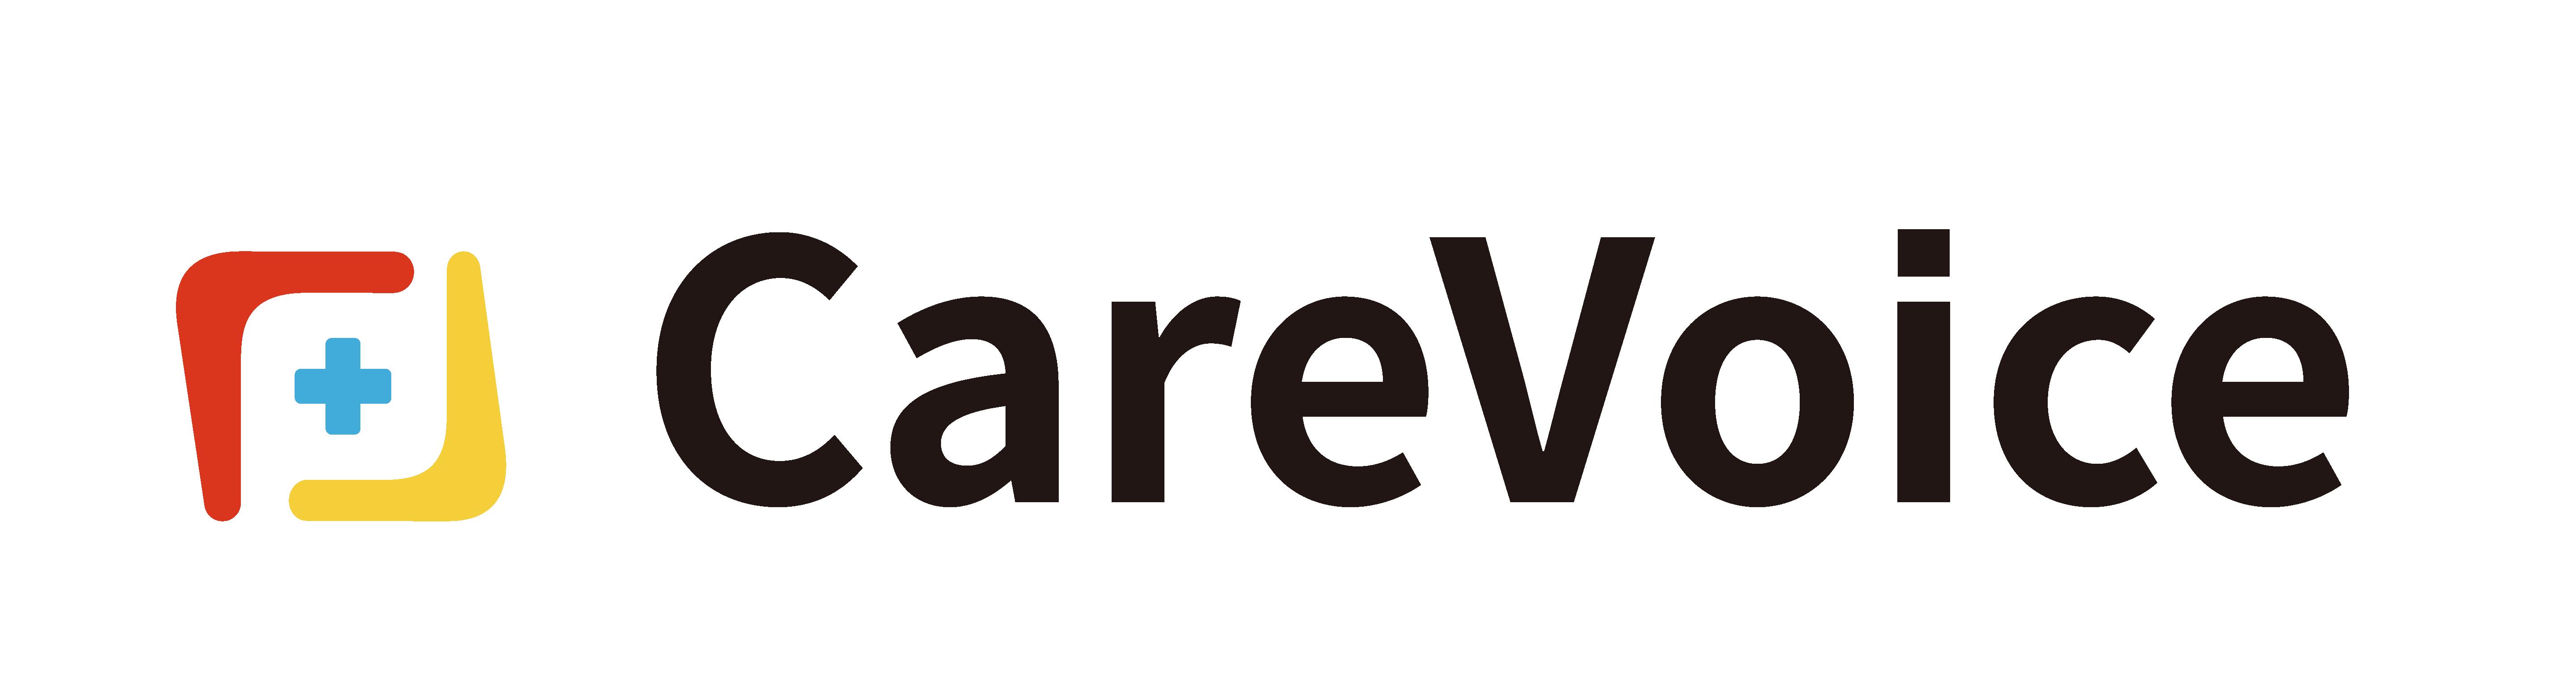 The CareVoice logo